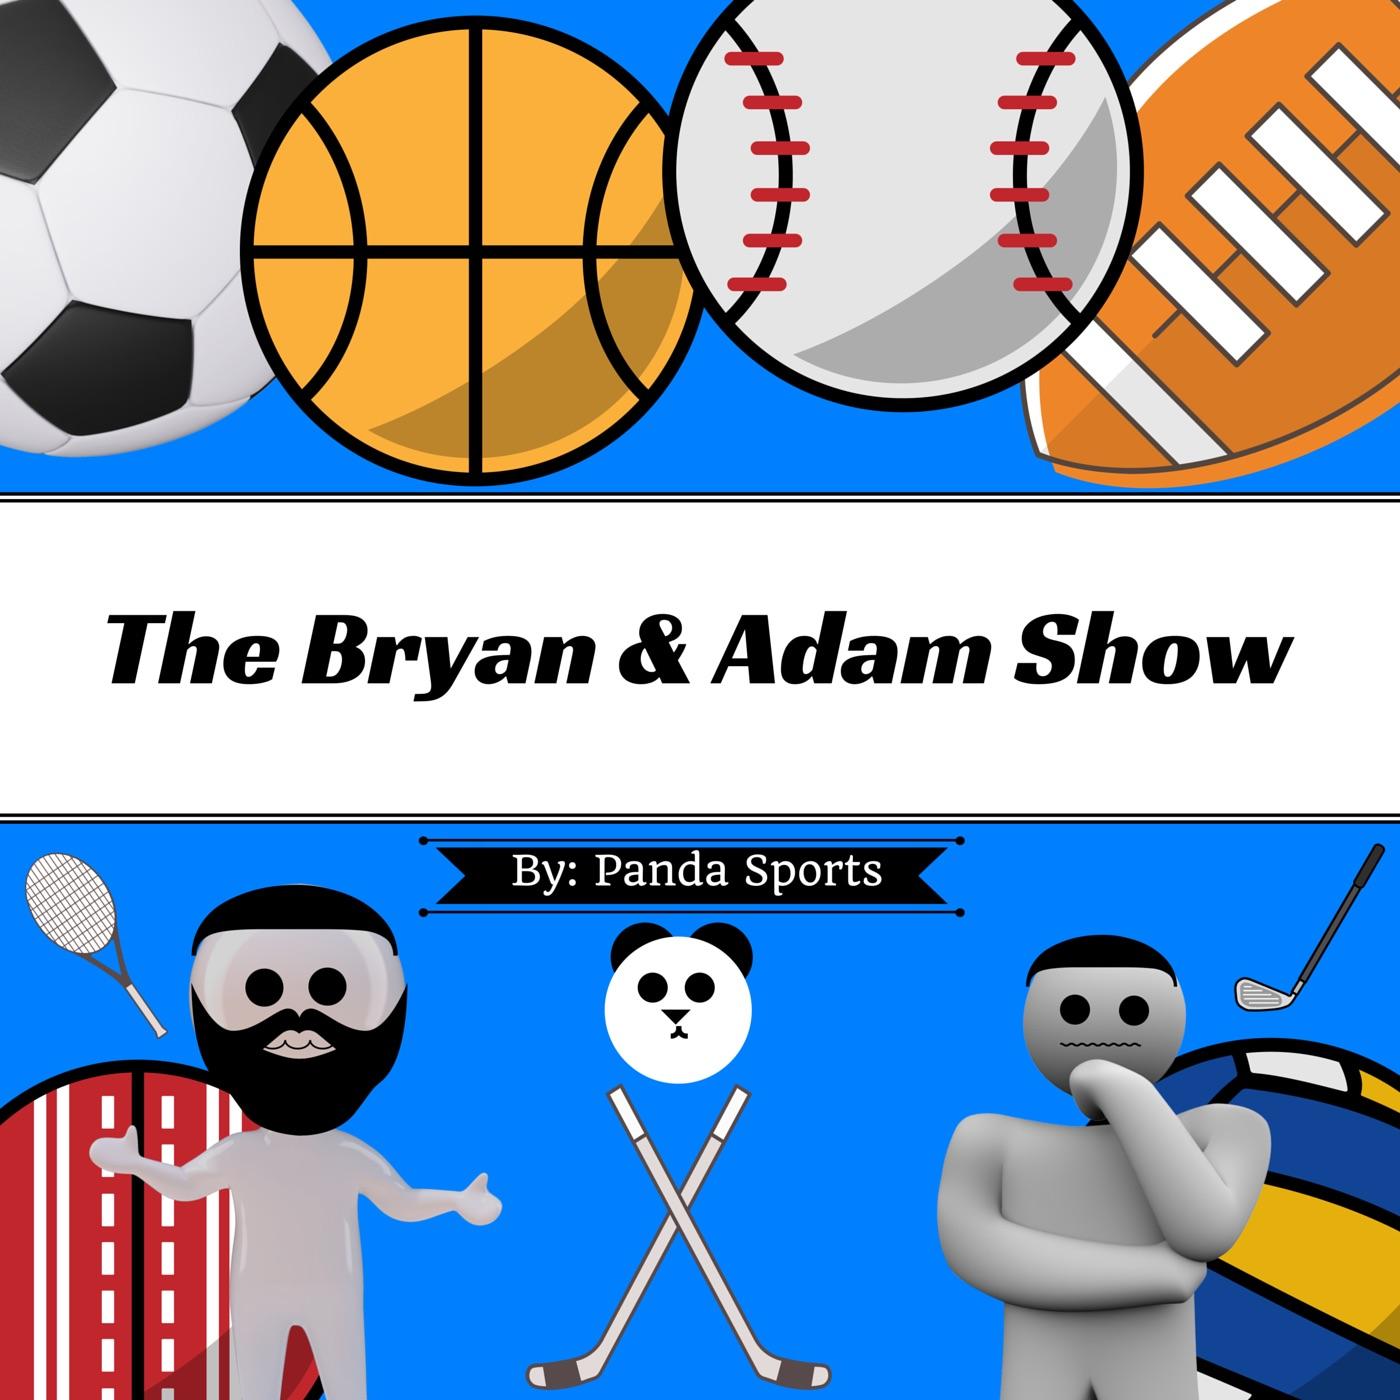 Bryan & Adam Show